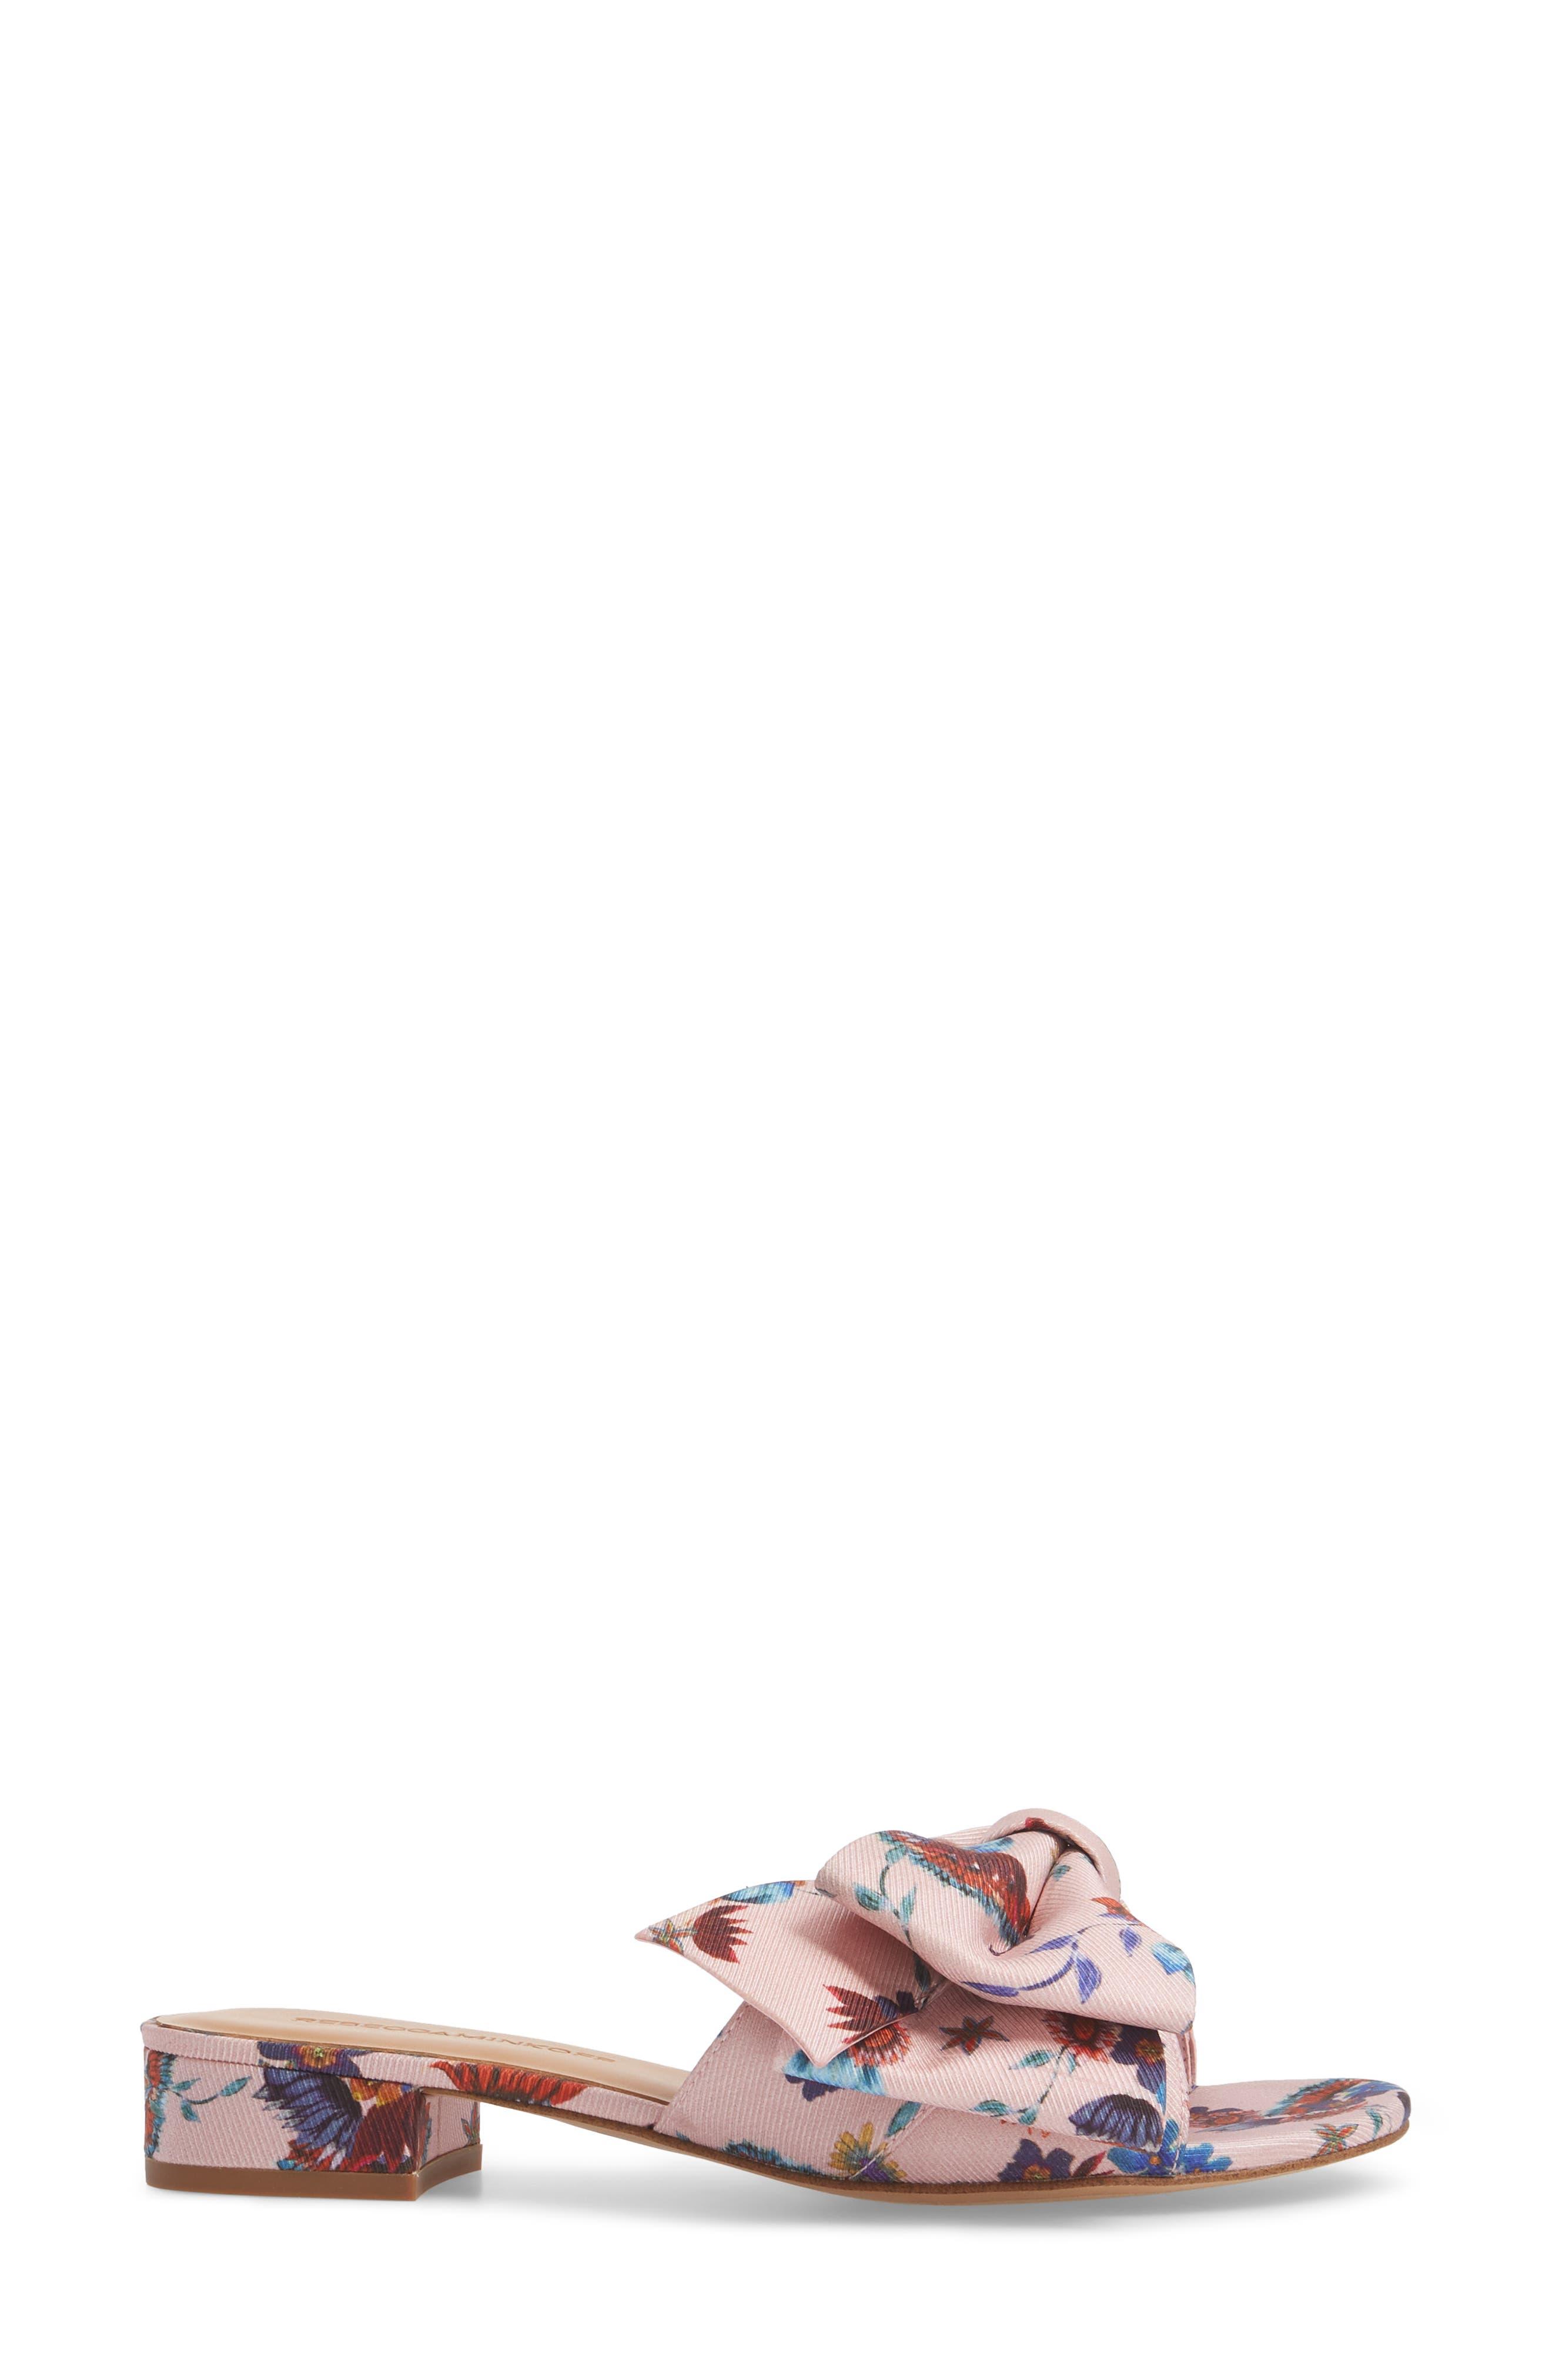 Calista Slide Sandal,                             Alternate thumbnail 3, color,                             Millennial Pink Multi Fabric